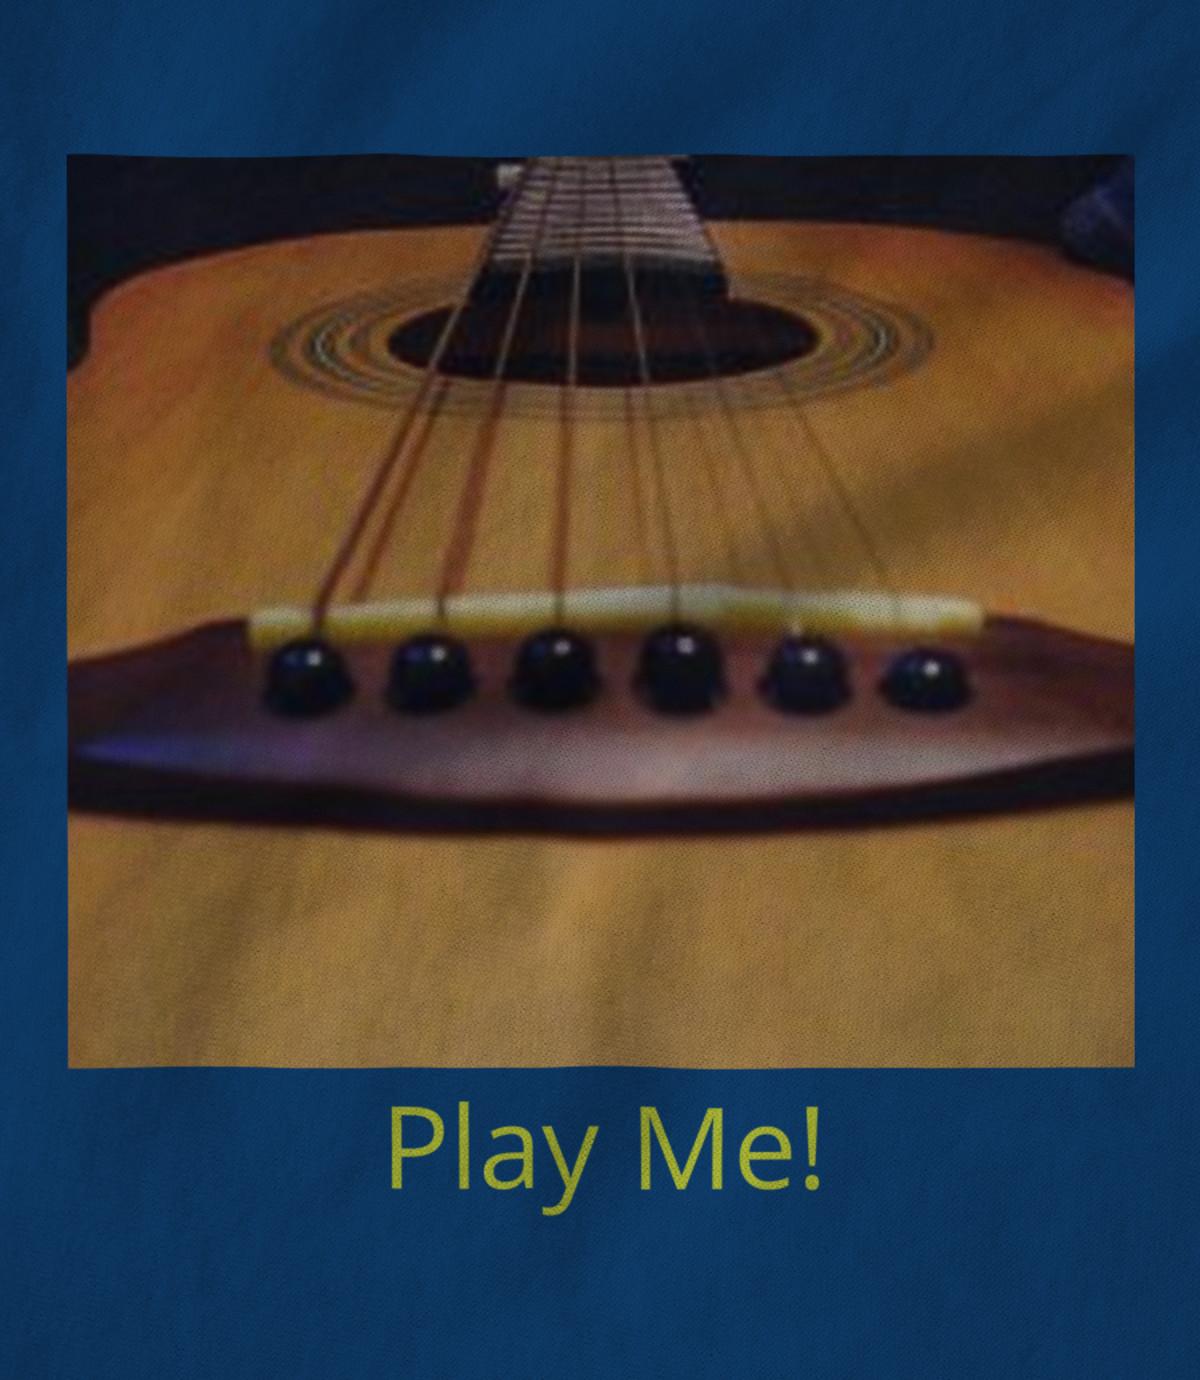 Matthew f  blowers iii   2017 play me  1506451552